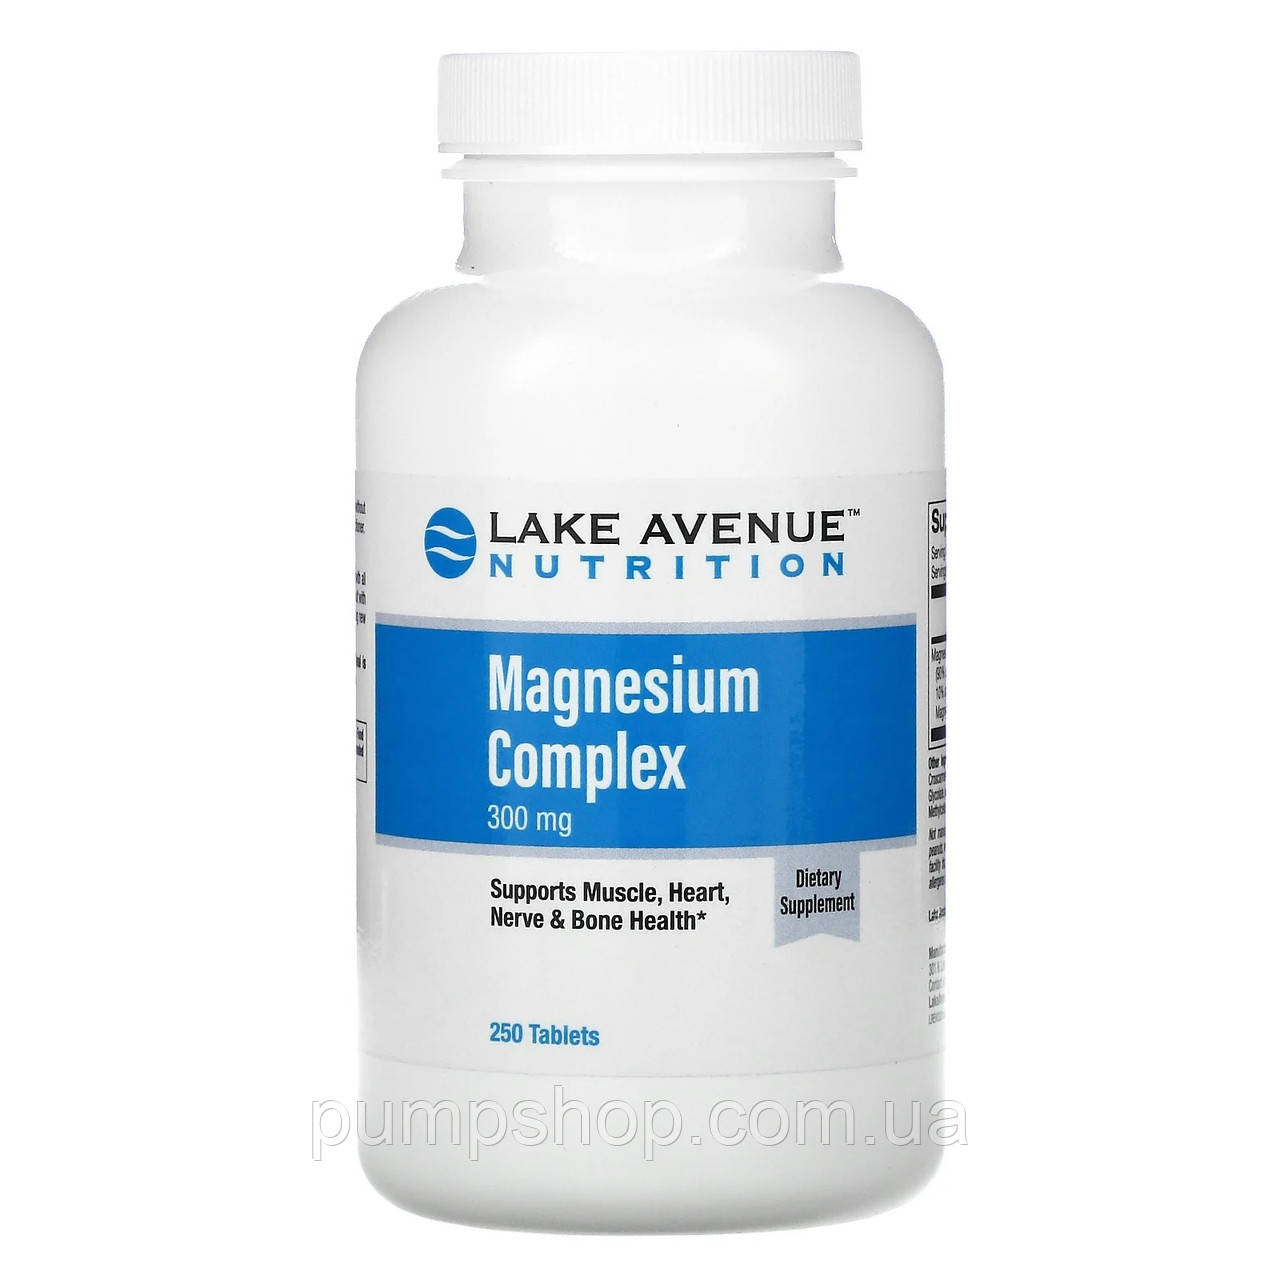 Комплекс магния Lake Avenue Nutrition Magnesium Complex 300 мг 250 таб.